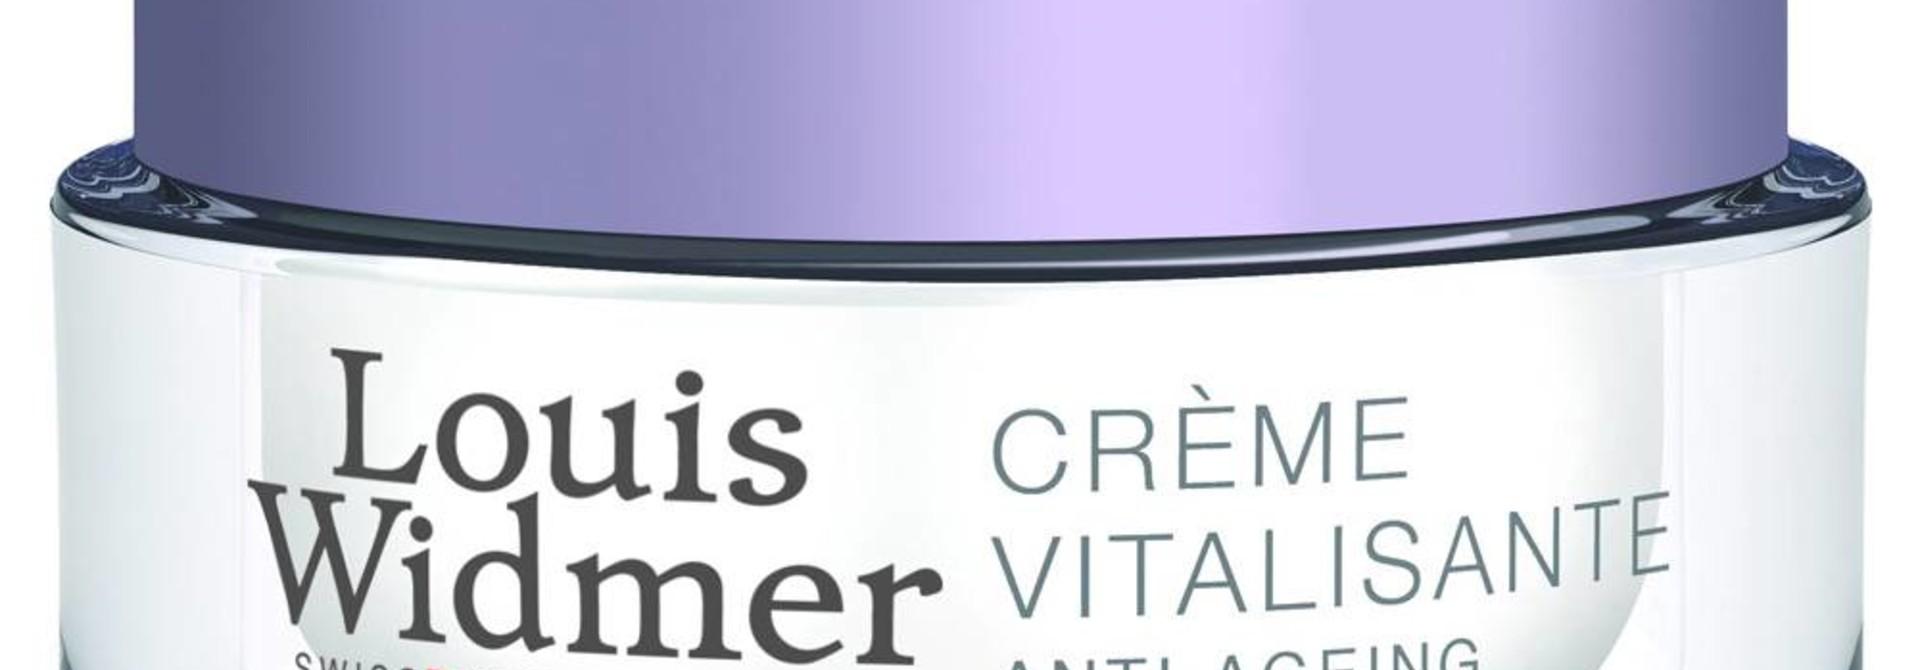 Crème Vitalisante 50 ml licht geparfumeerd